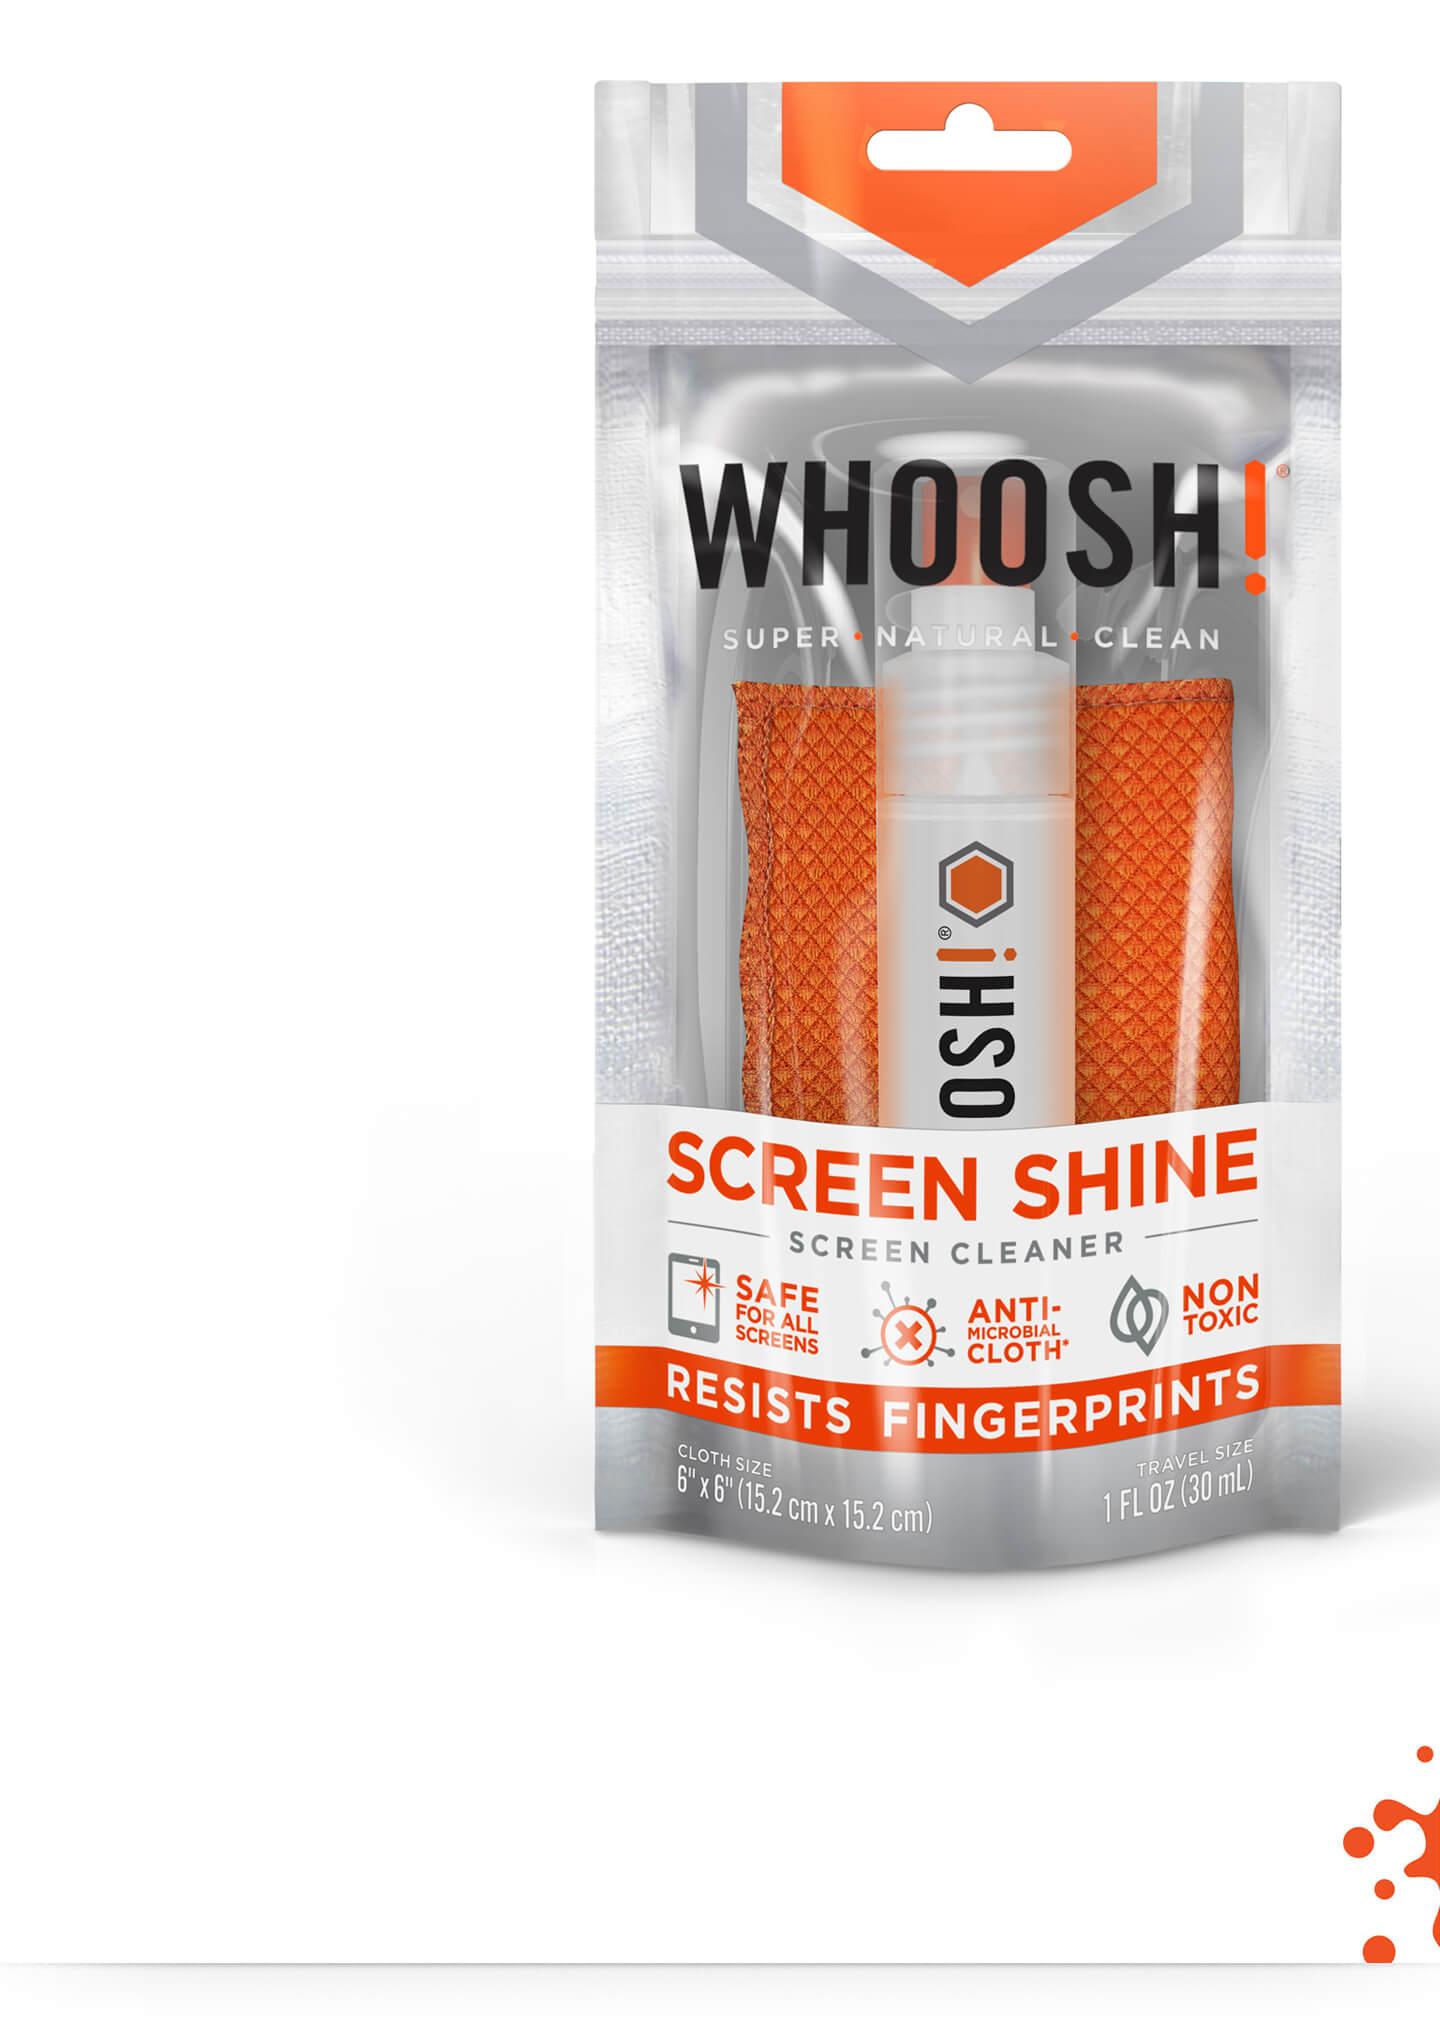 Whoosh!® Screen Shine